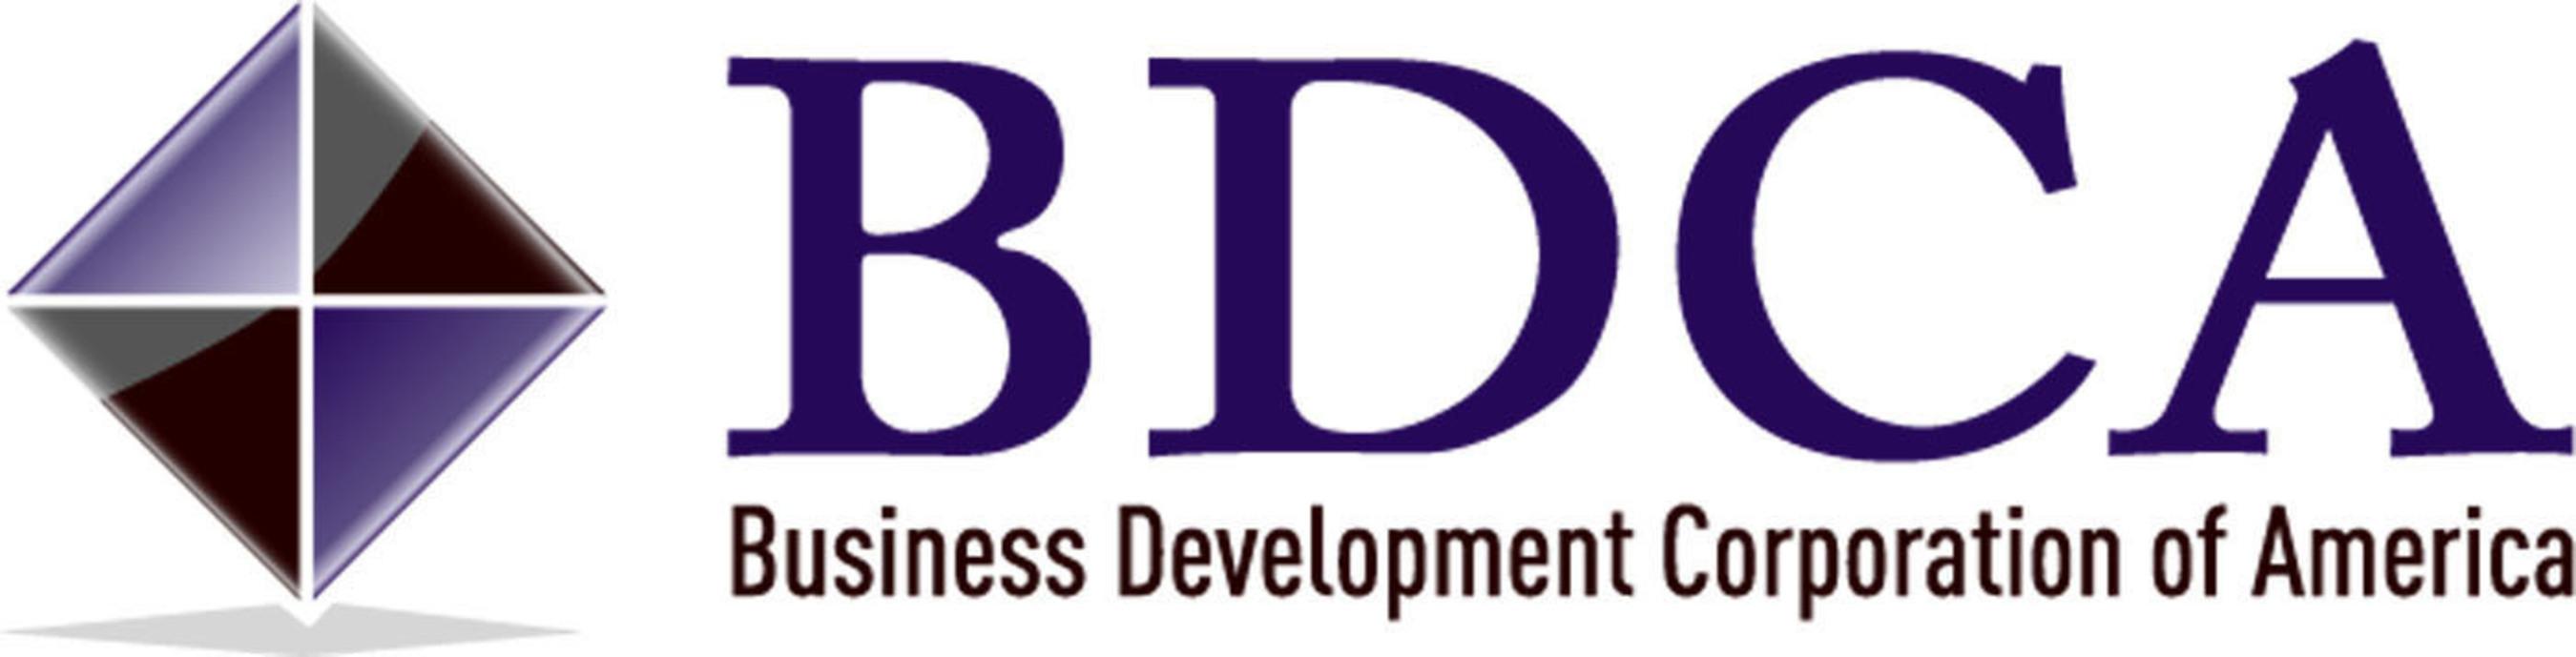 Business Developt Corporation of America Announces Decrease in ...